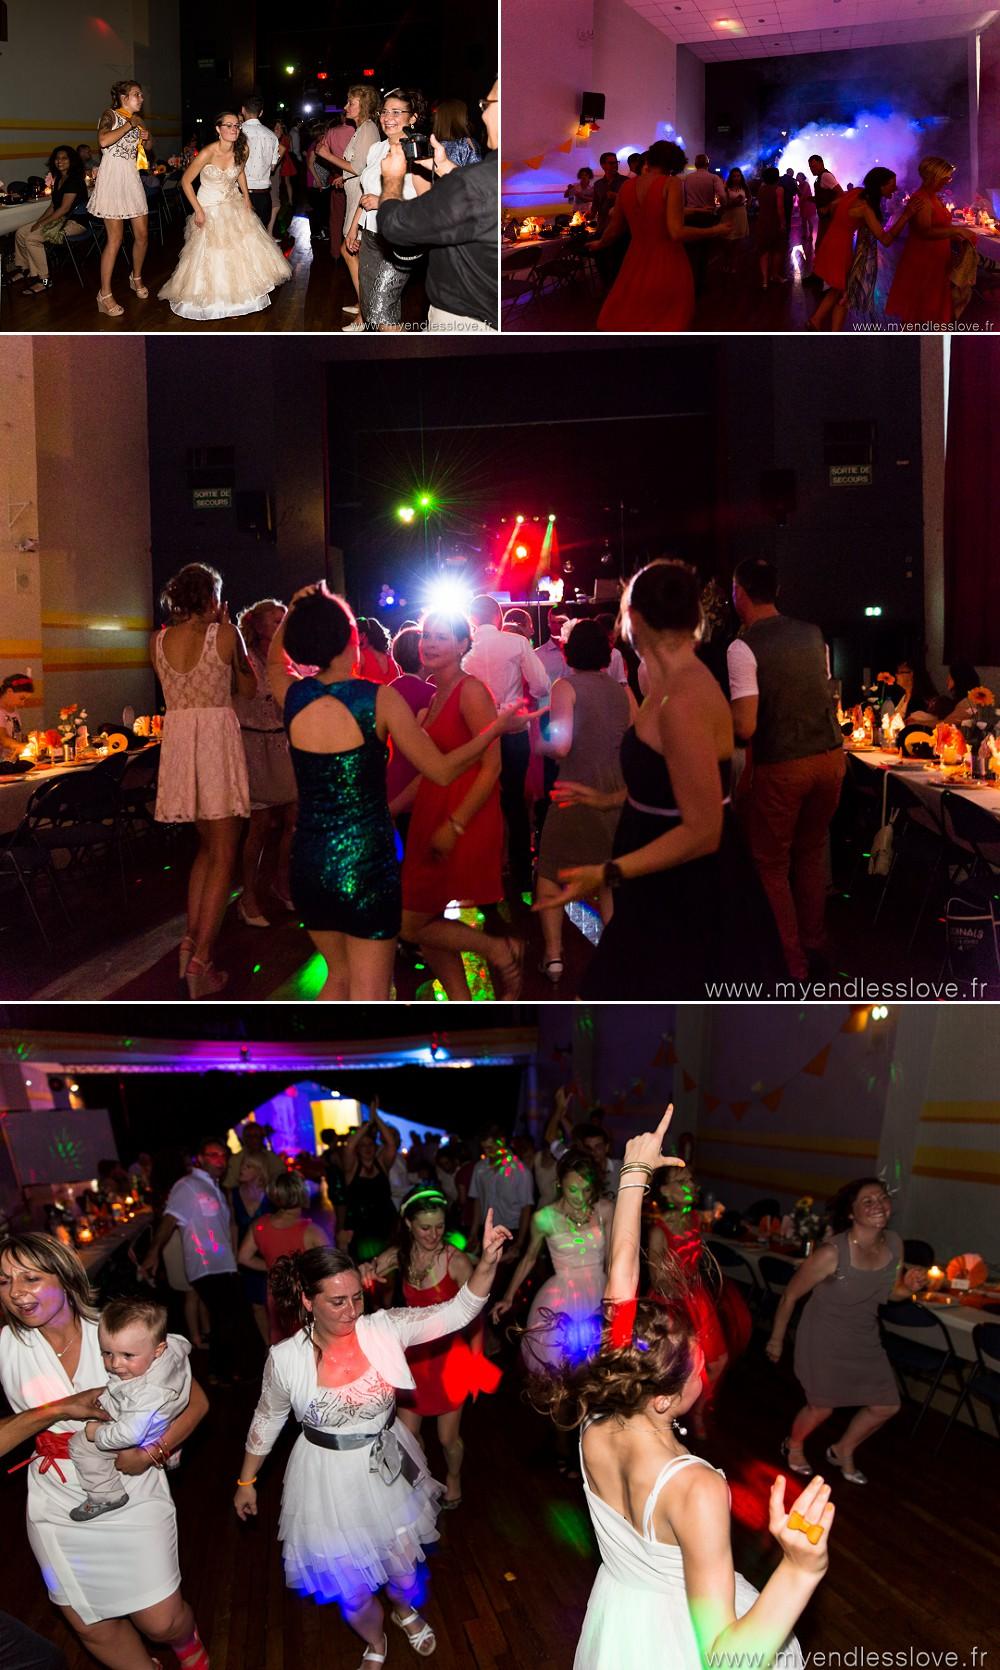 myendlesslove-photographe-mariage-lille-8-Strasbourg-Hénin Beaumont-soirée-danse-photobooth-melanie-reichhart (2)